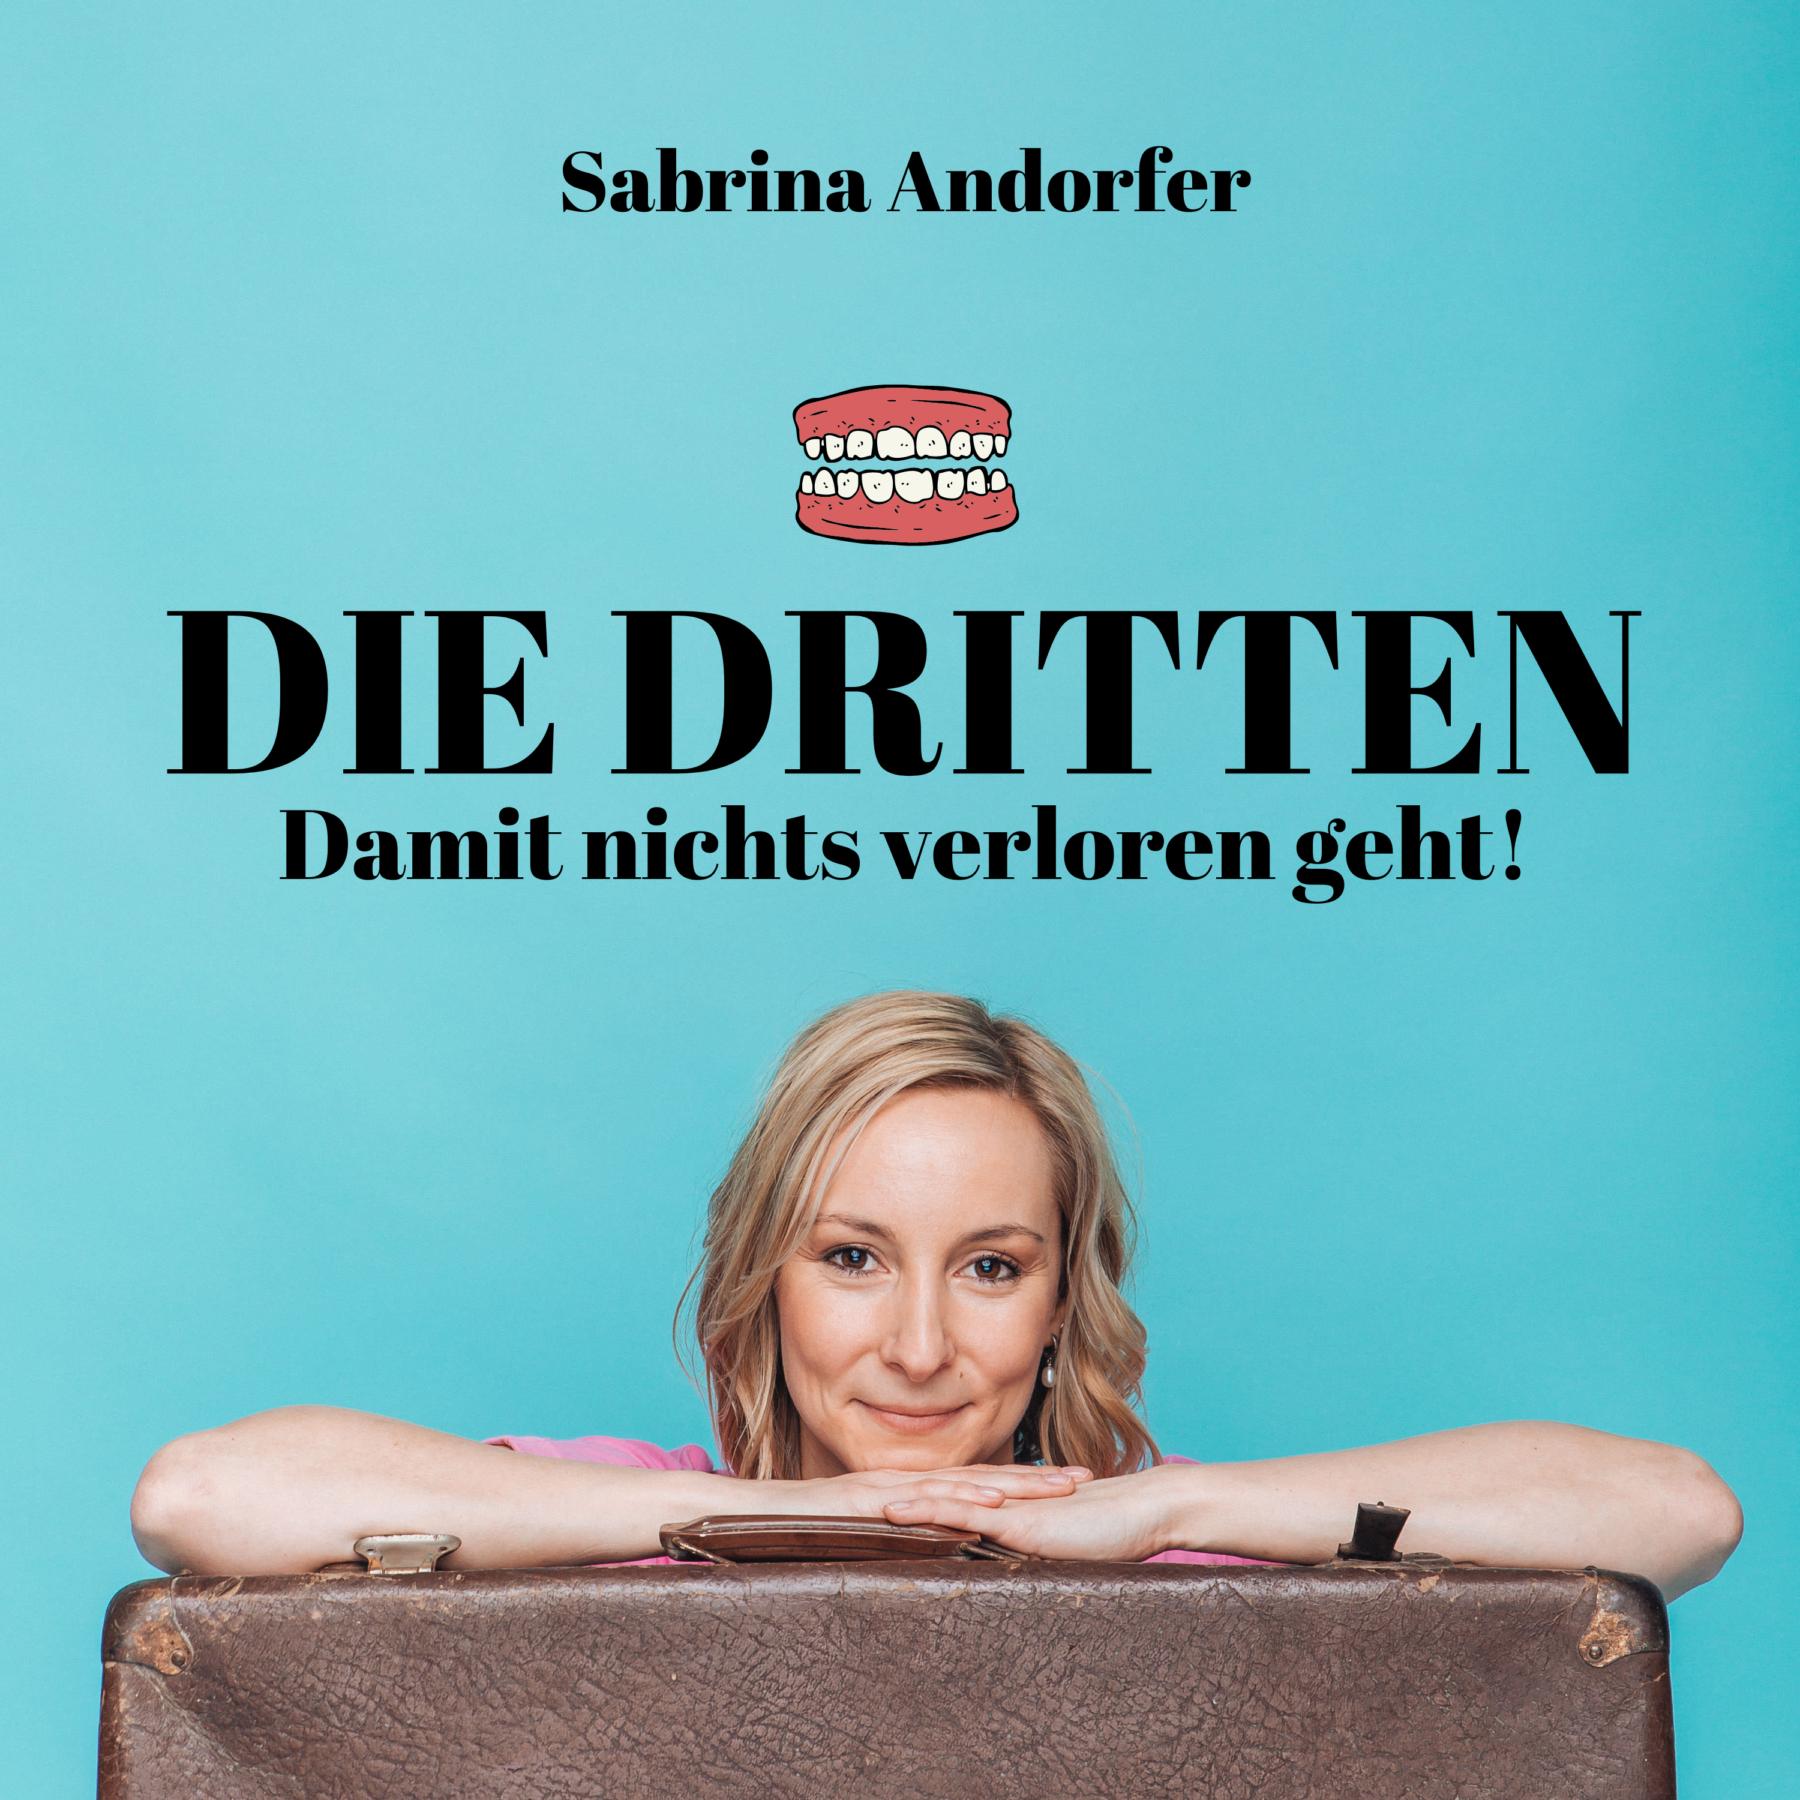 Titelbild von Sabrina Andorfers Podcast